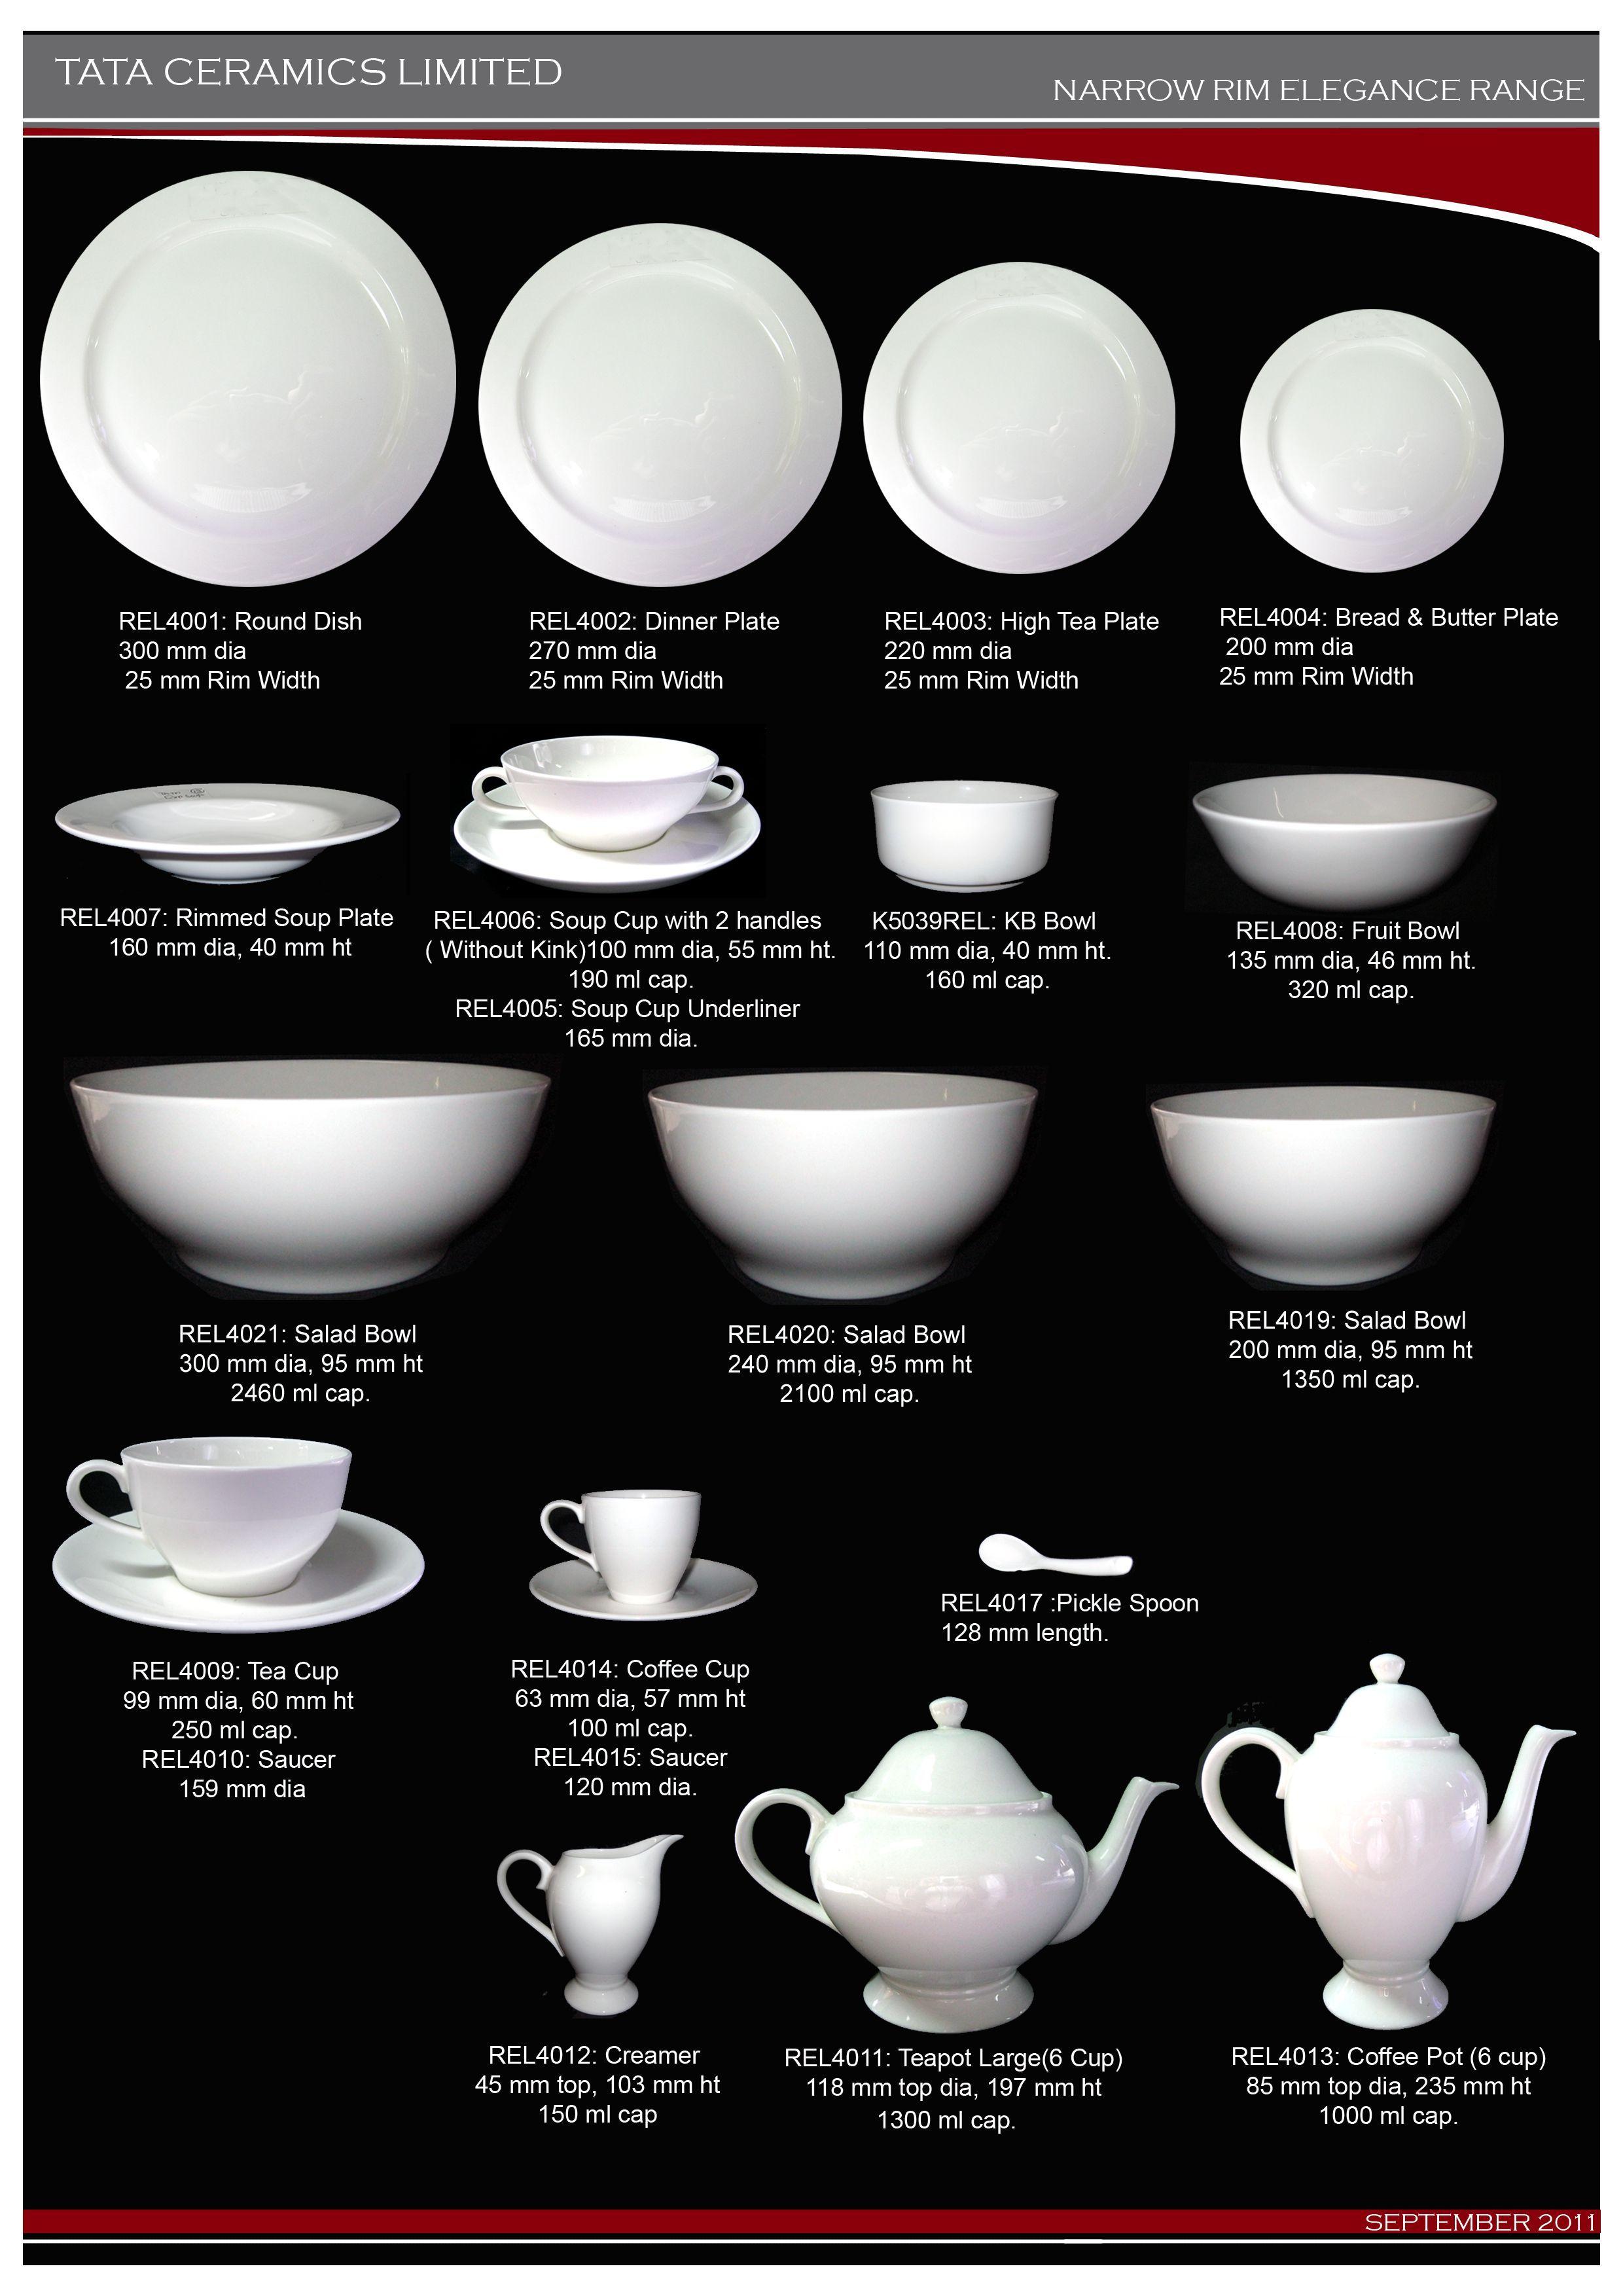 Narrow Rim Elegance Range Bone China Rim Tableware